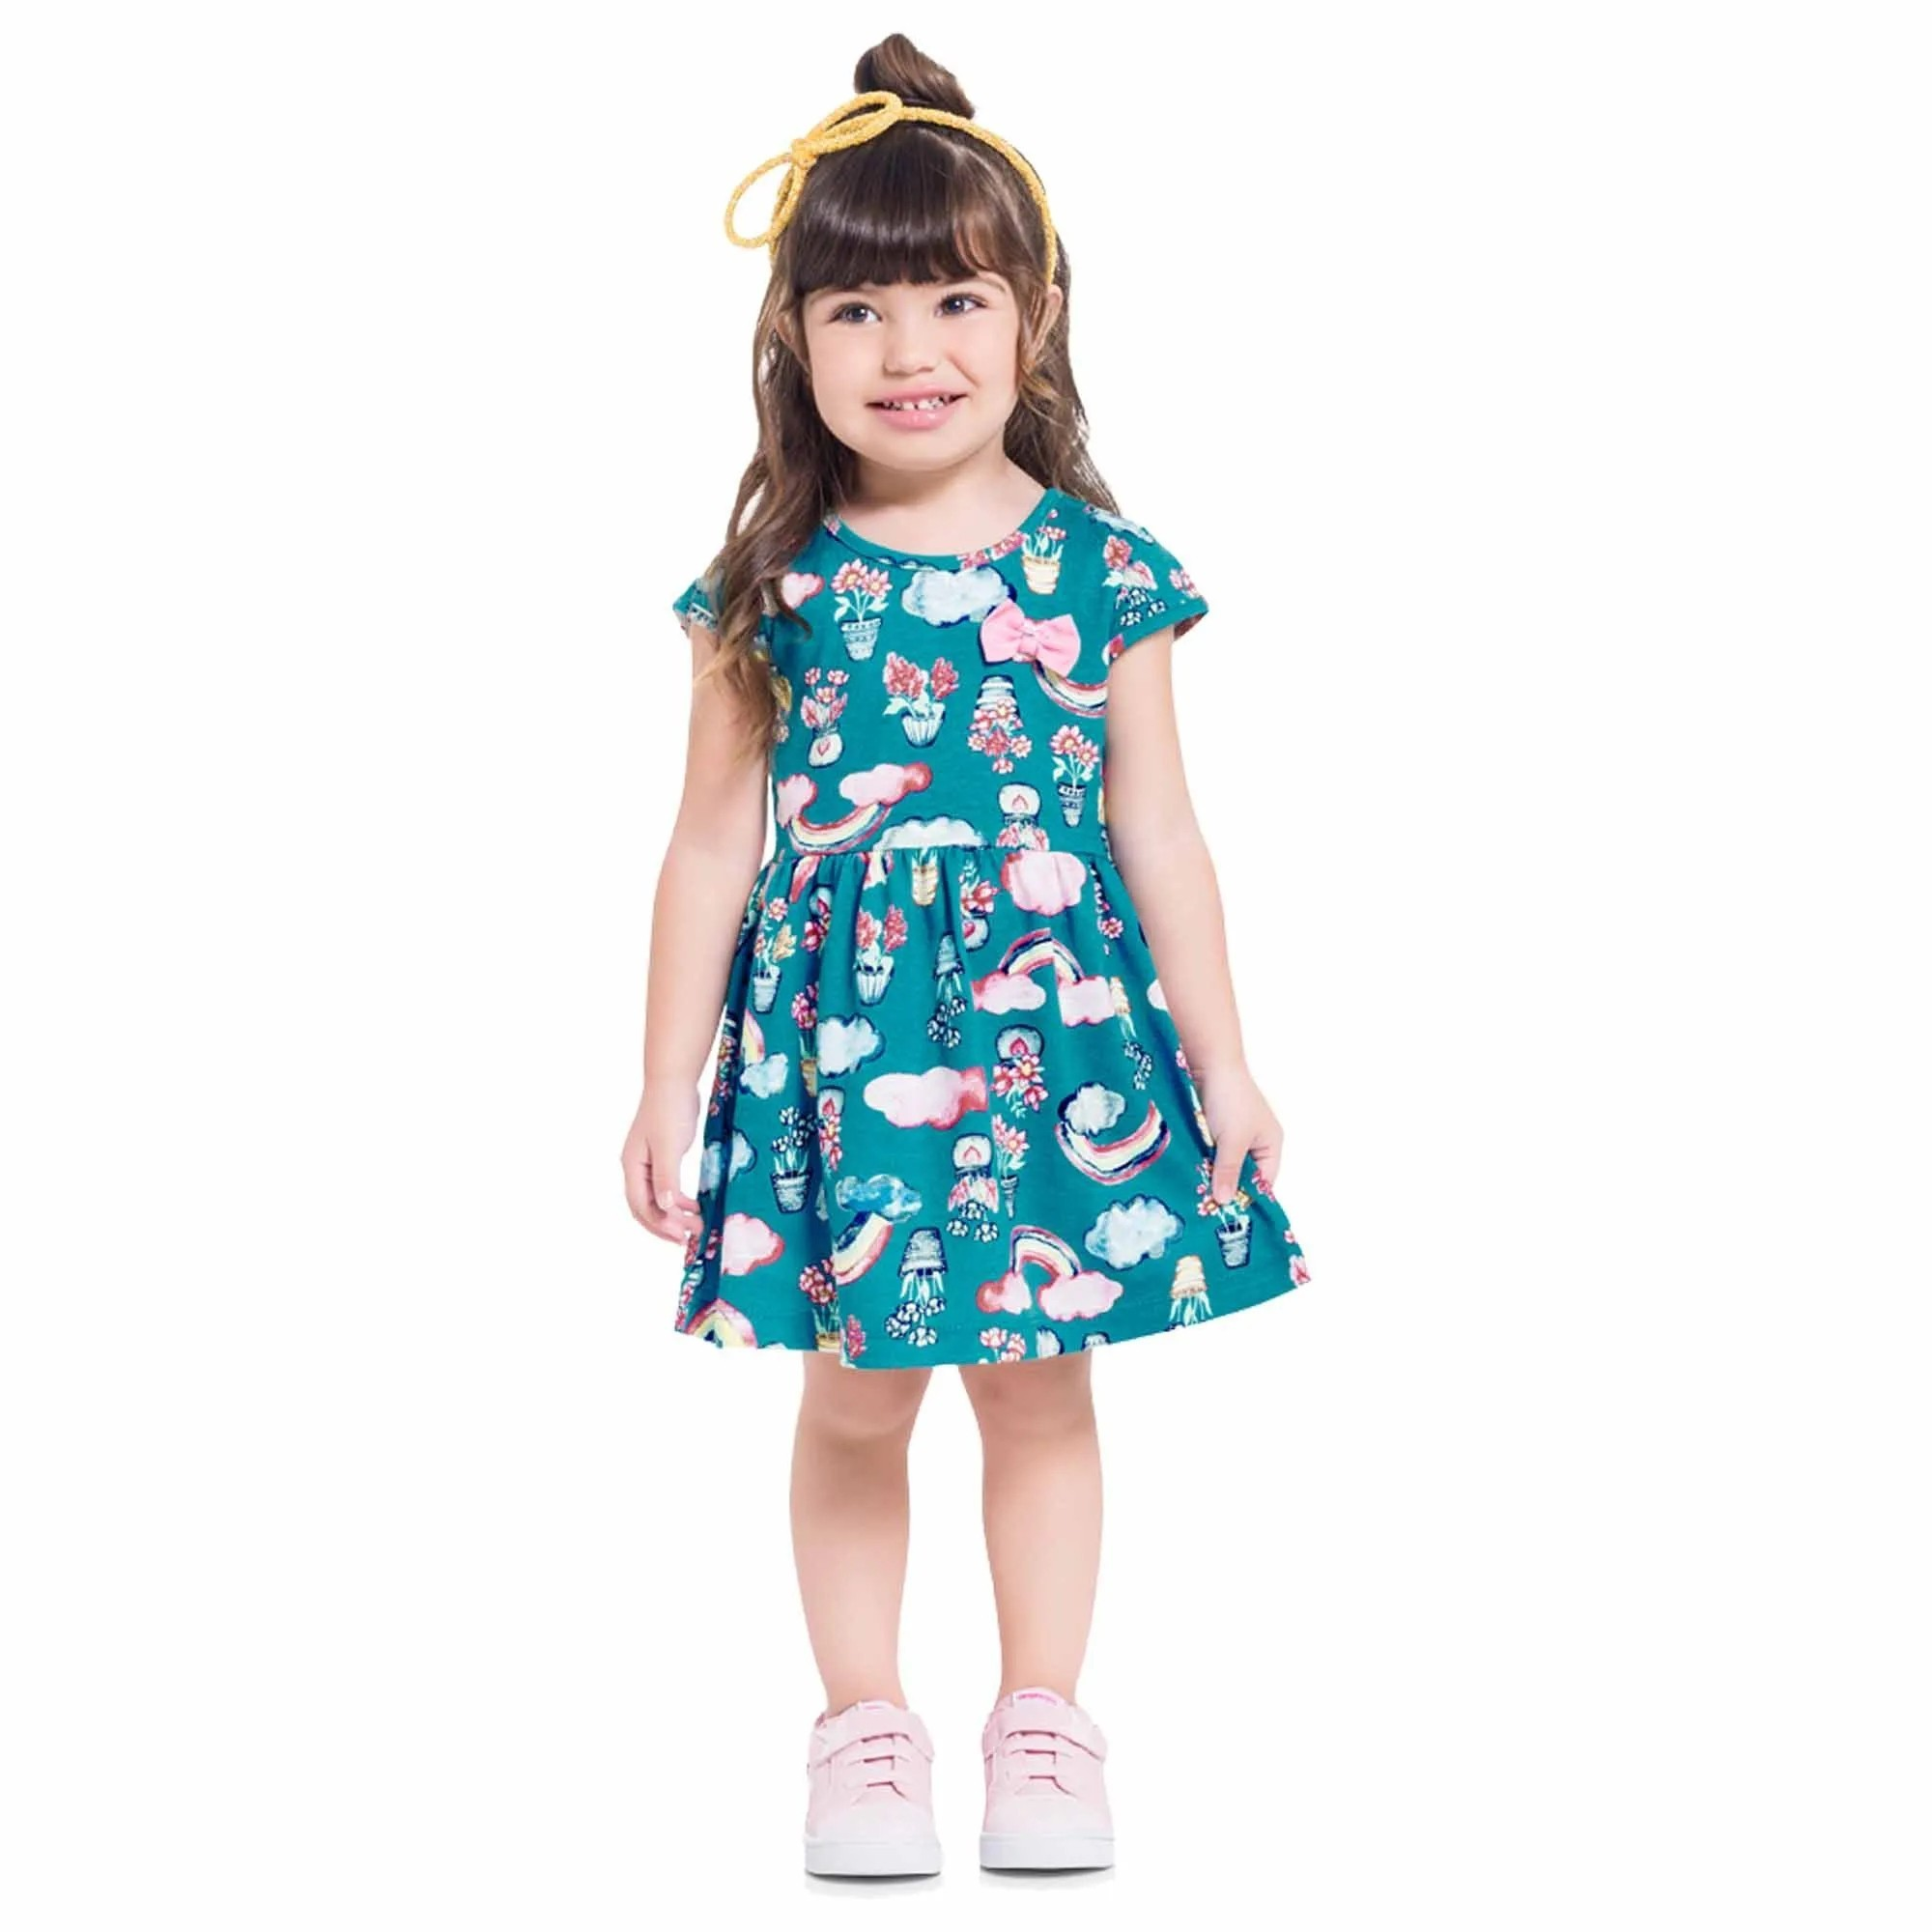 Vestido Verão Brandili Meia Malha - 1 ao 3